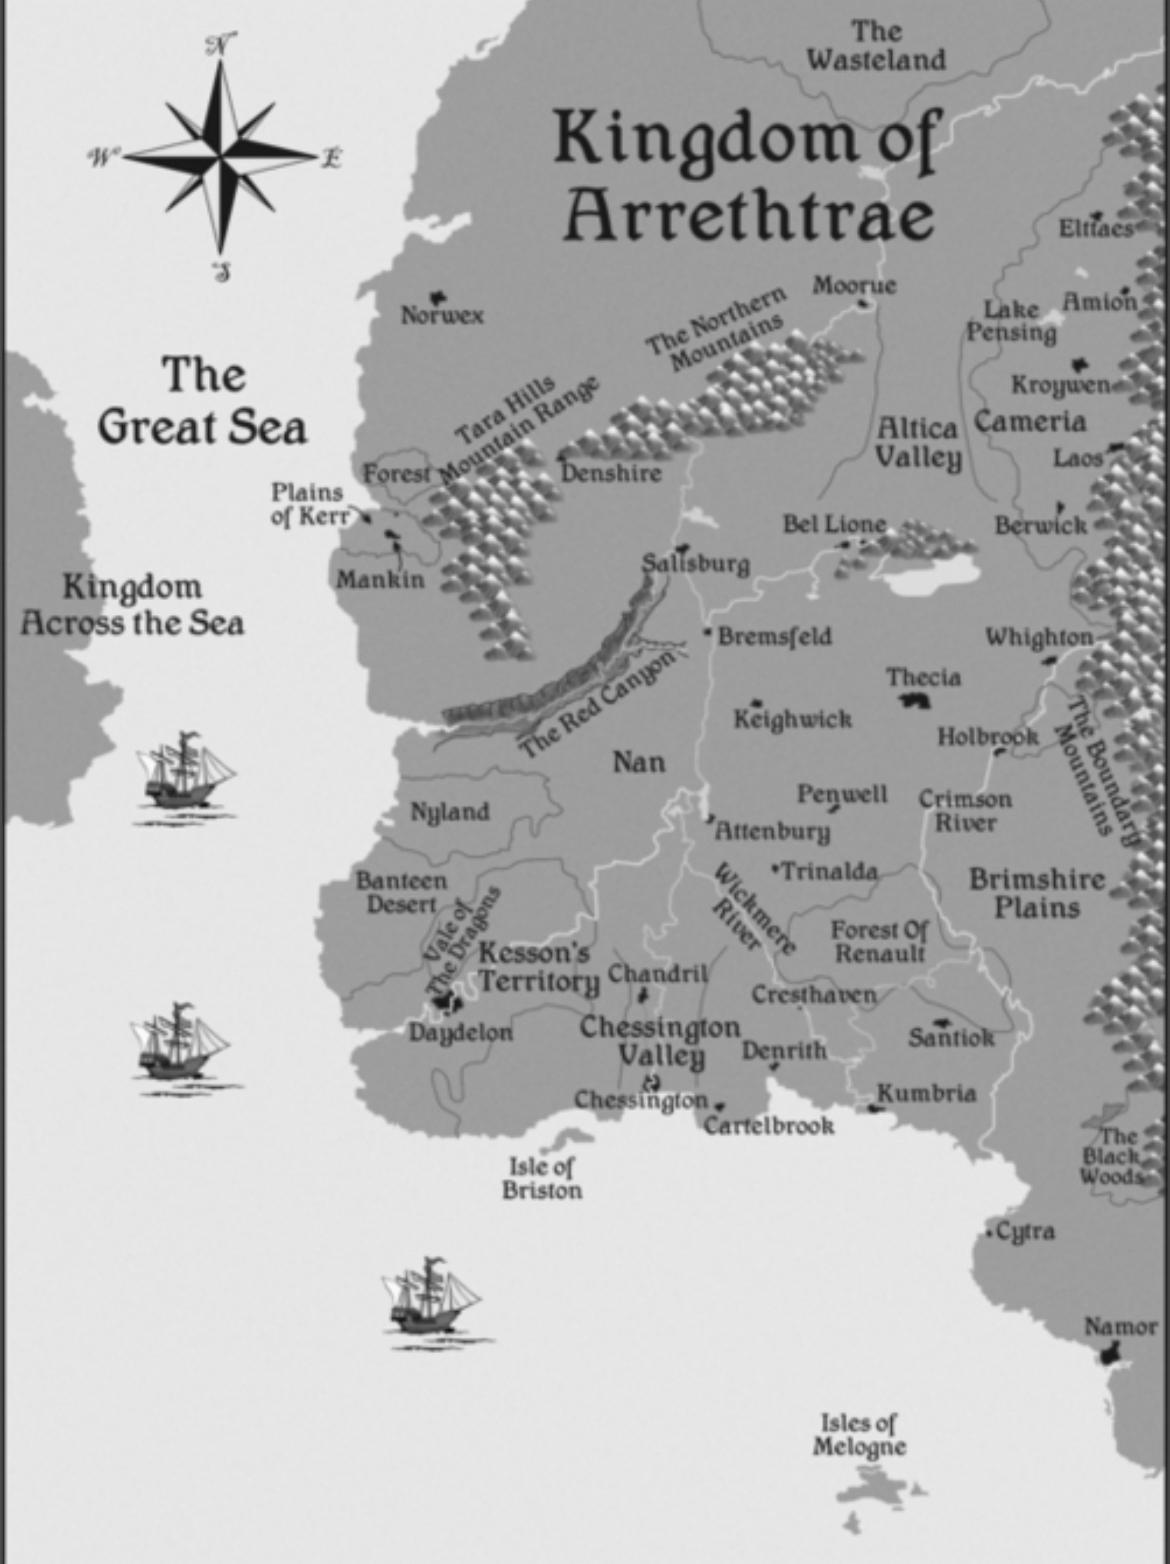 File:Map of Arrethtrae Chessington.jpg